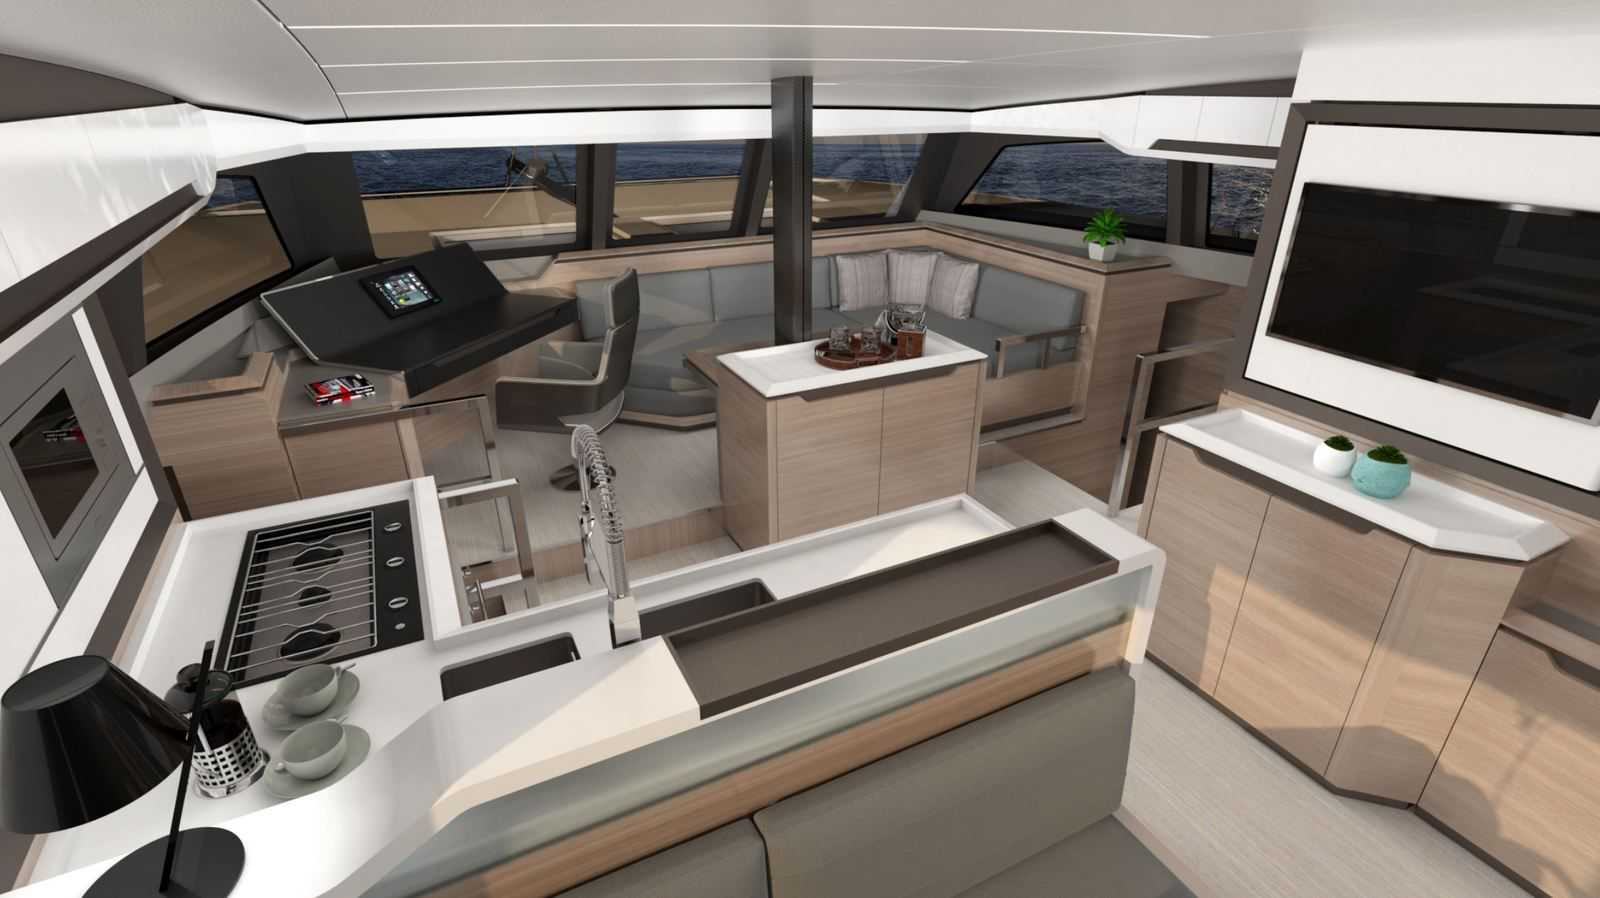 Catana Ocean Class - Blauwasser Katamaran mit hoher Leistung... im offenen Modus !